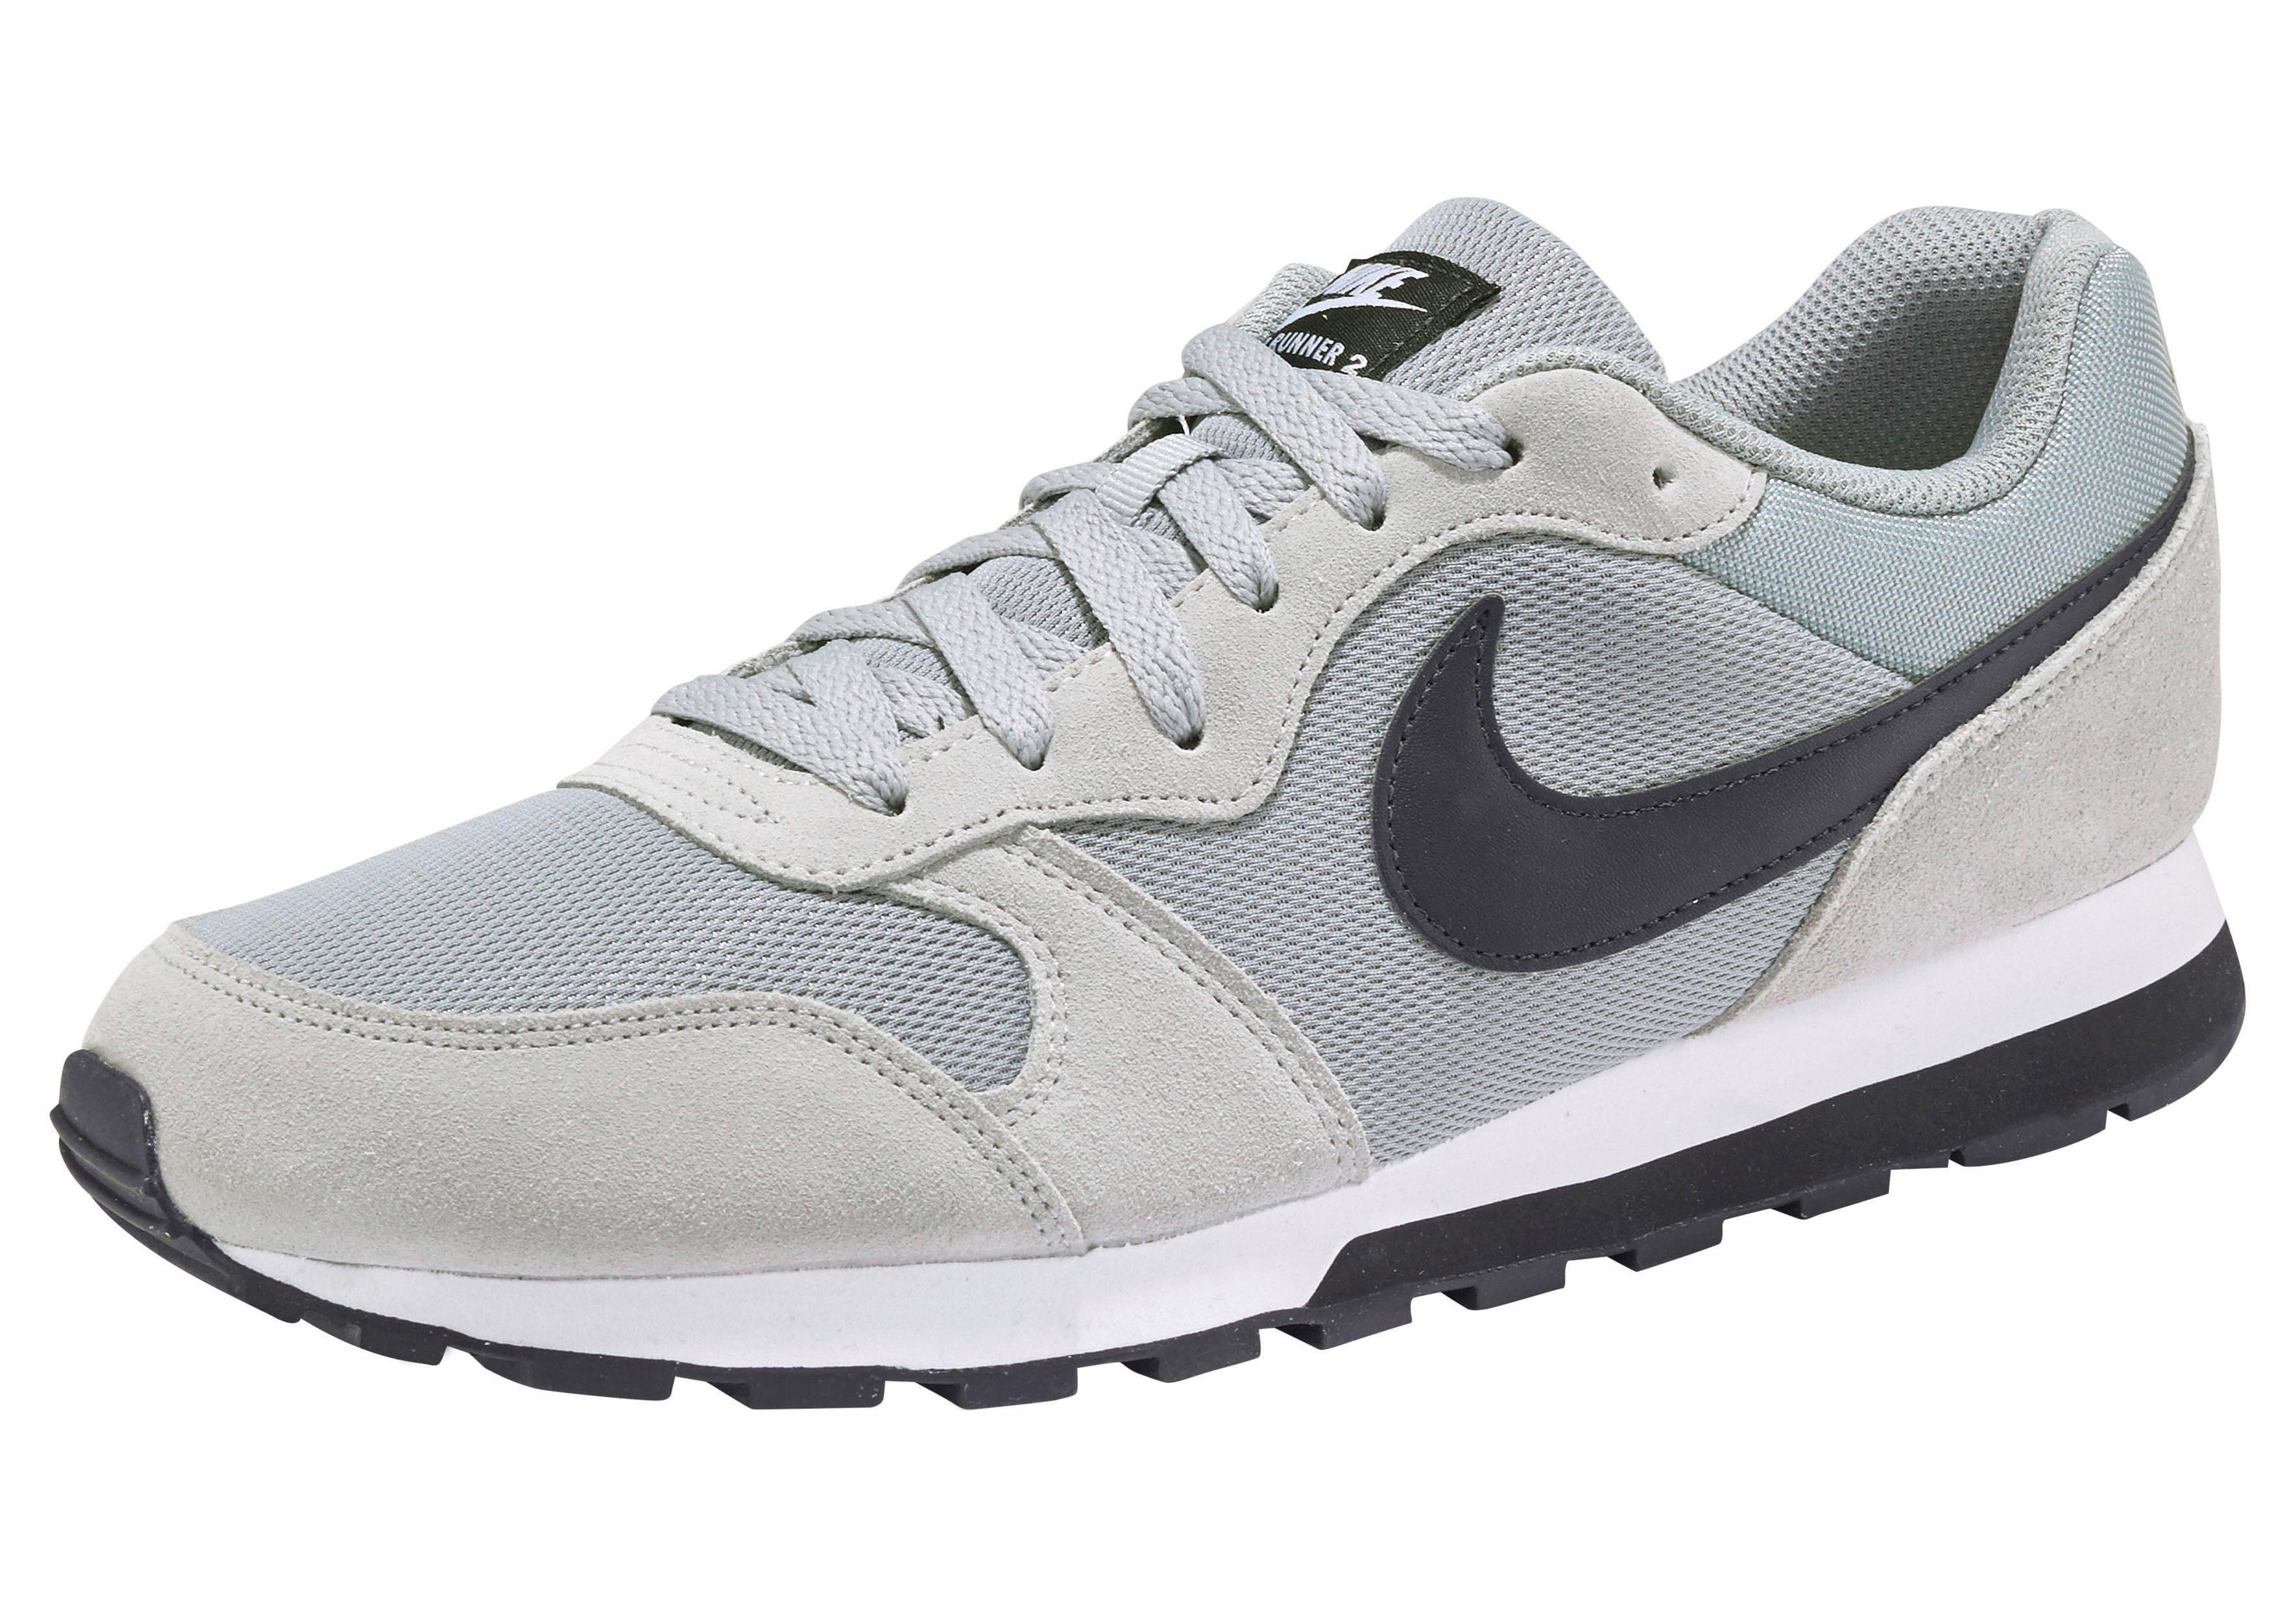 Frauen Männer Nike Damen, Sneaker, Md Runner 2 Blau